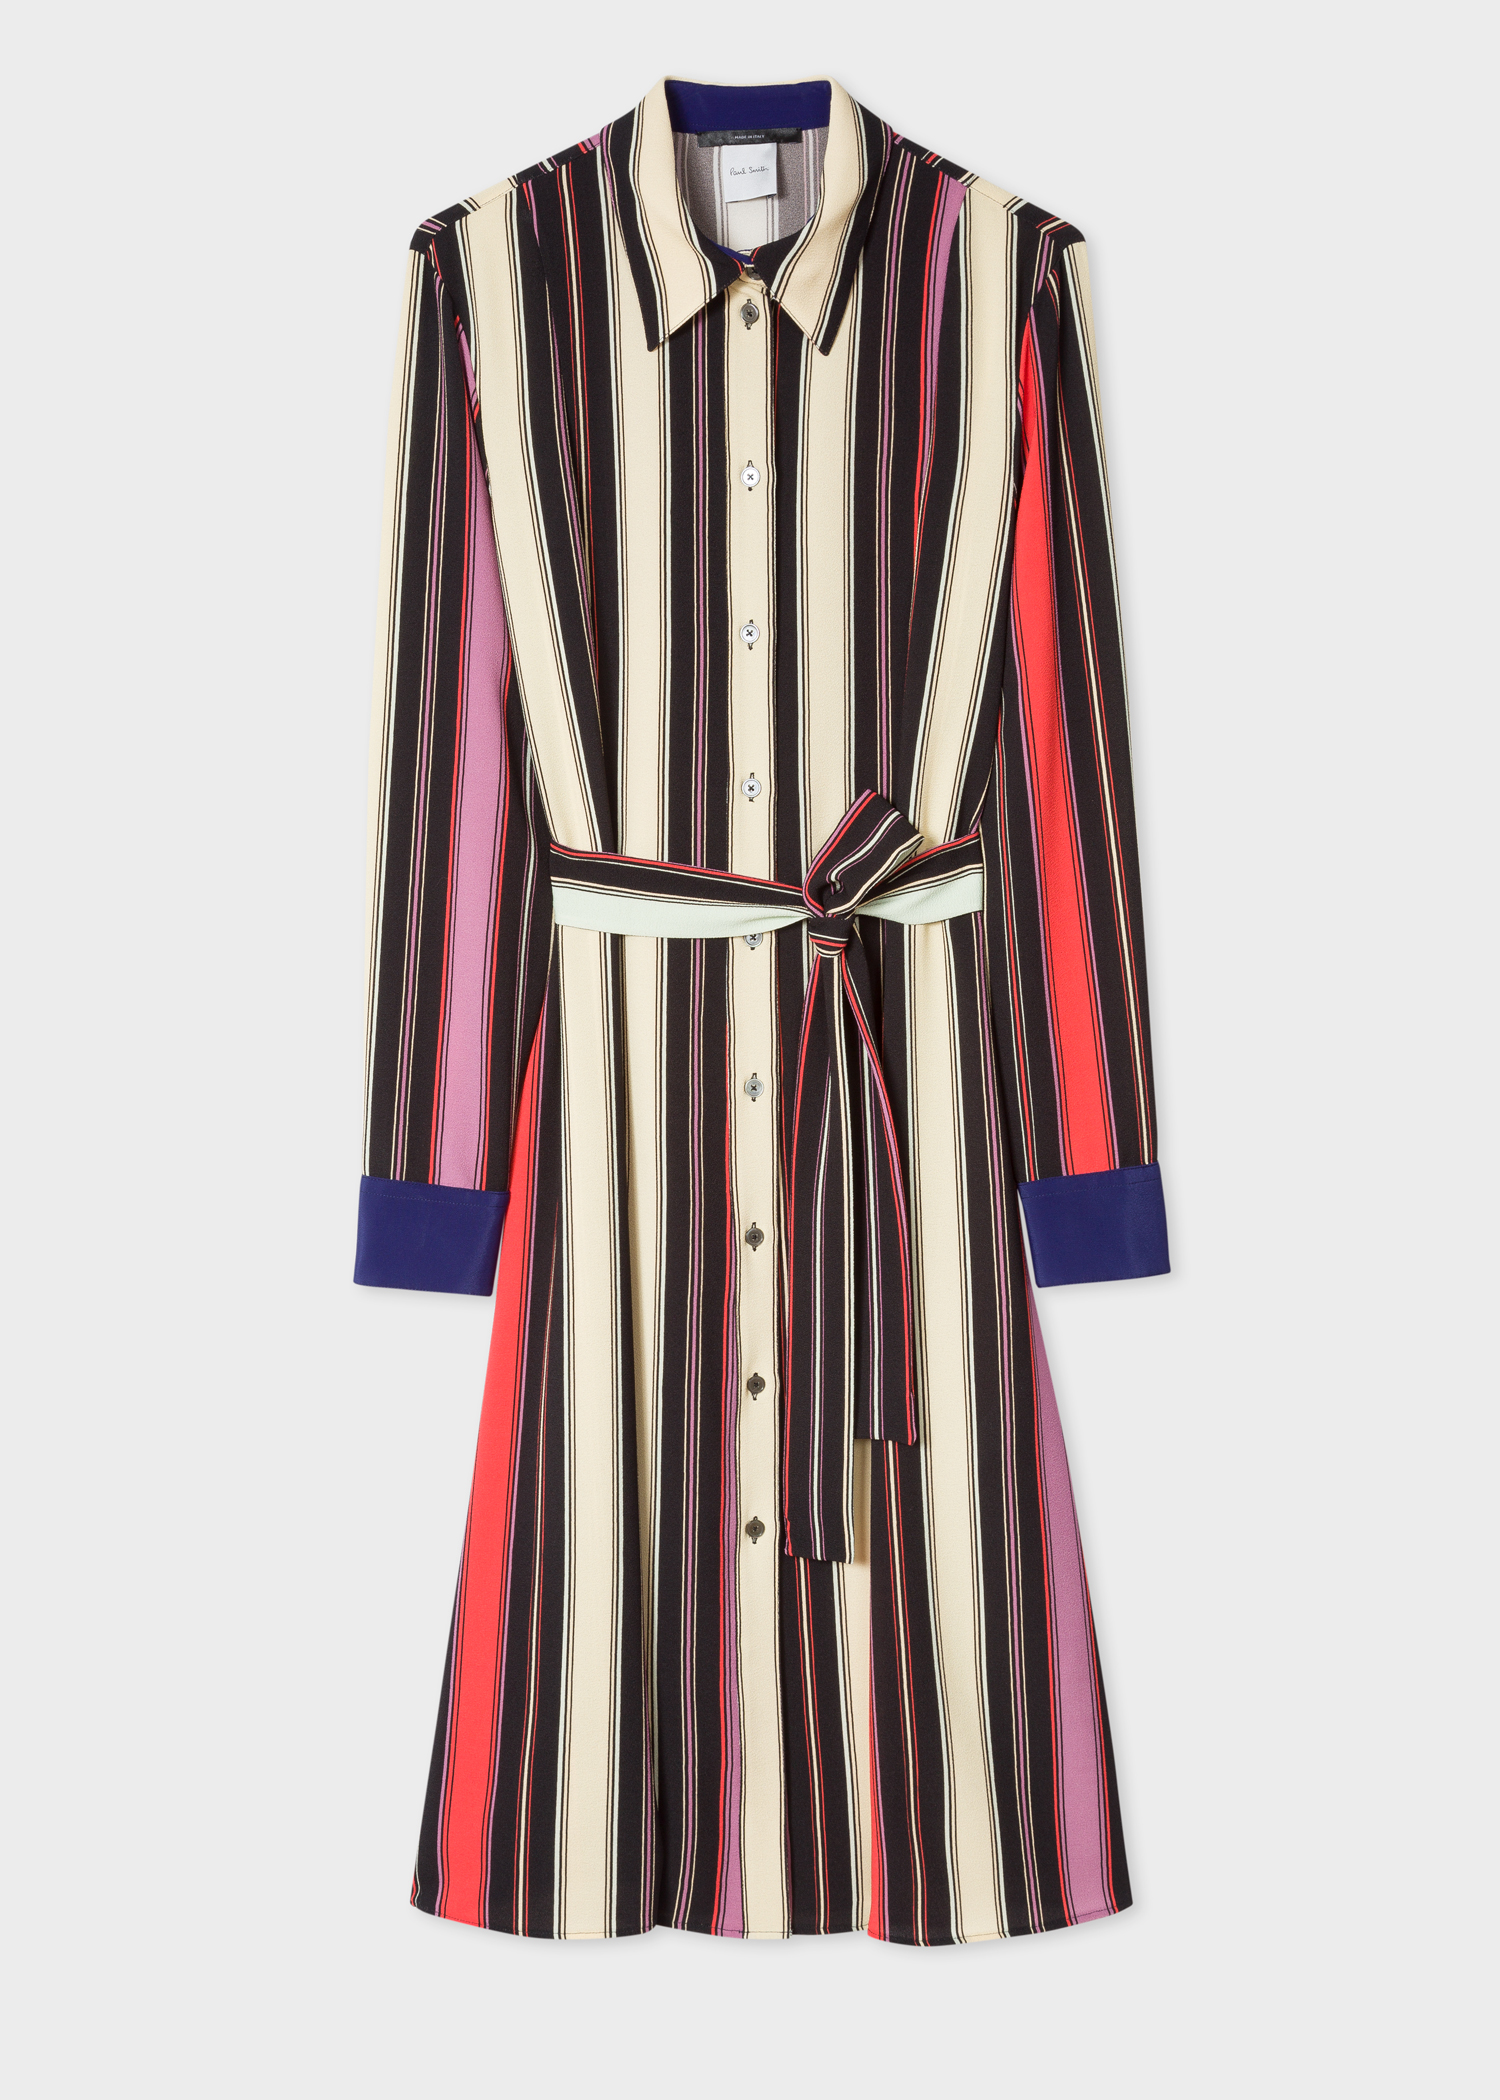 Front View - Women s Black Stripe Crepe Finish Shirt Dress Paul Smith 6fd12389f